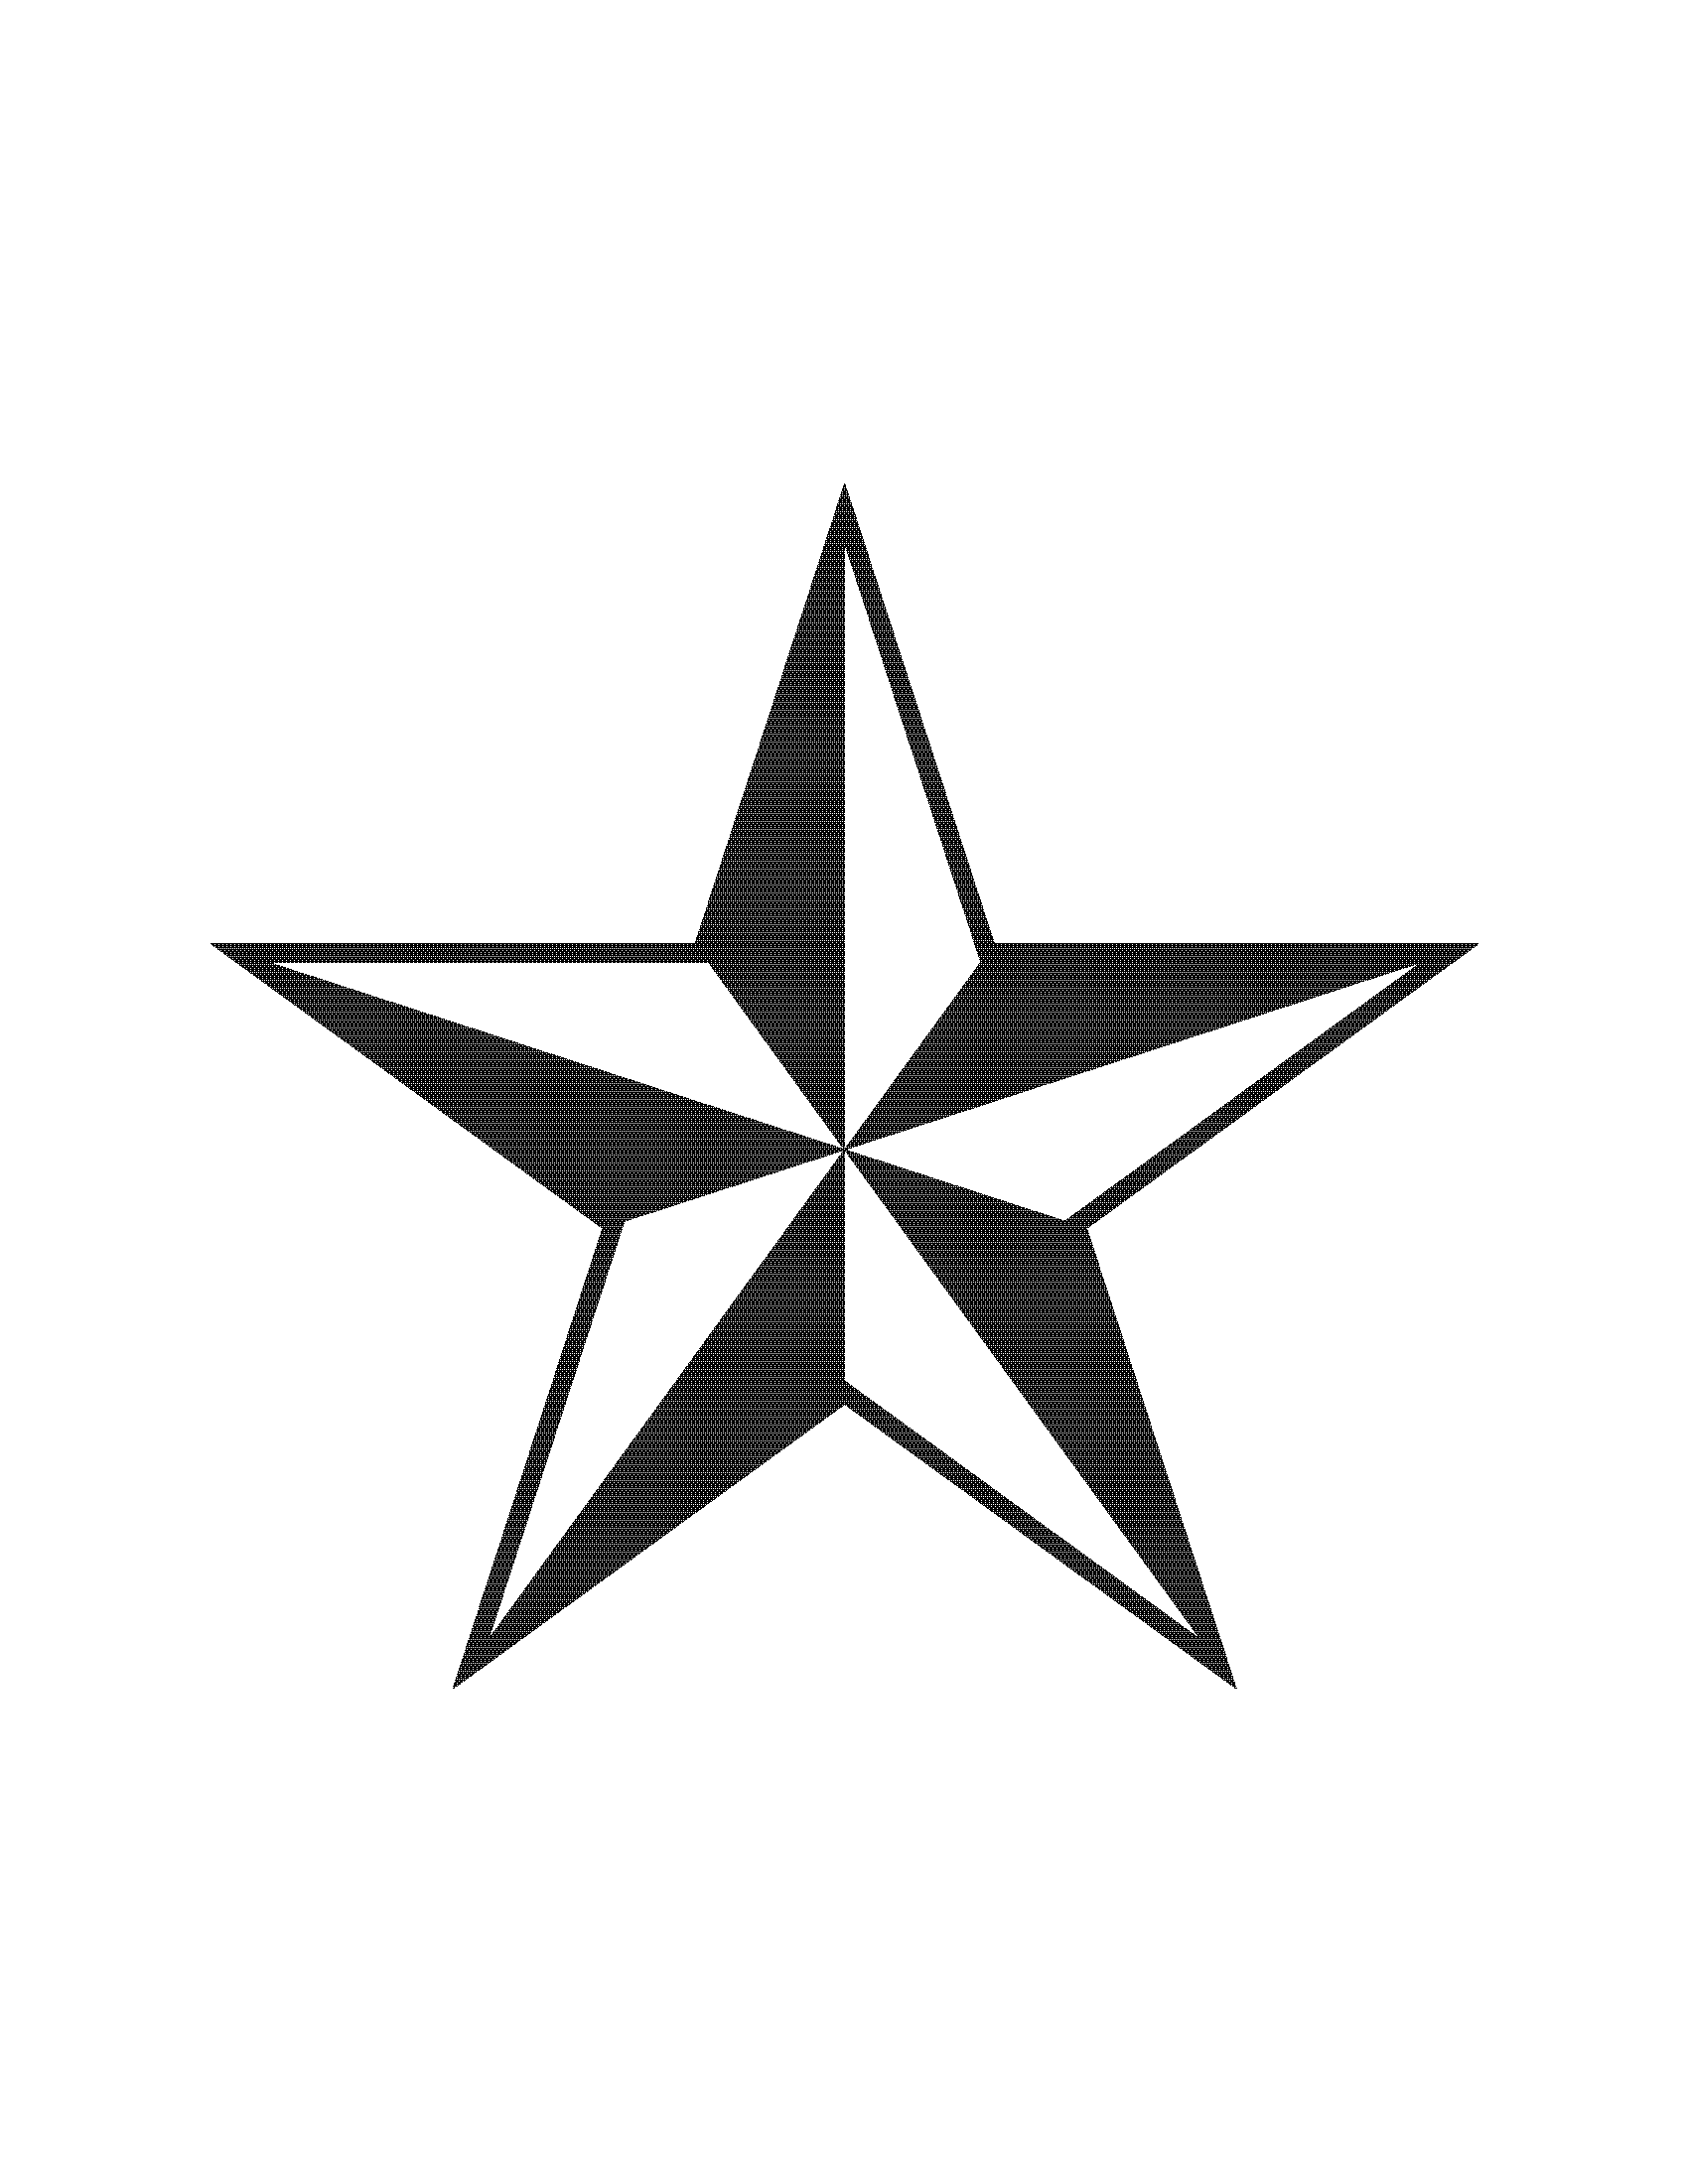 Texas Star Clip Art Star Tattoos Star Tattoo Designs Star Clipart